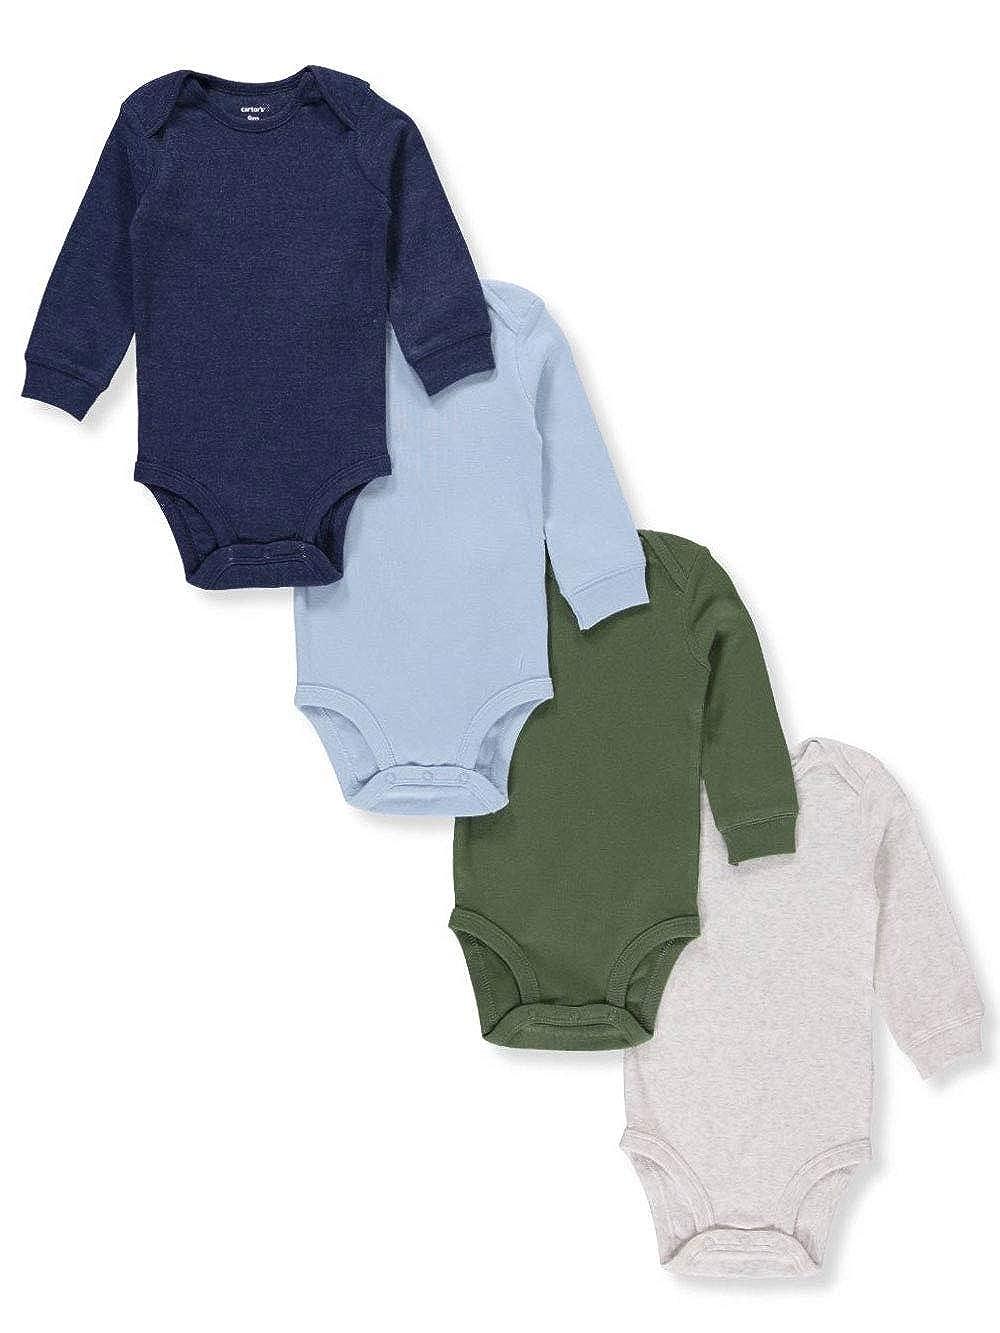 Carter's Unisex Baby 4-Pack L/S Bodysuits Carter' s